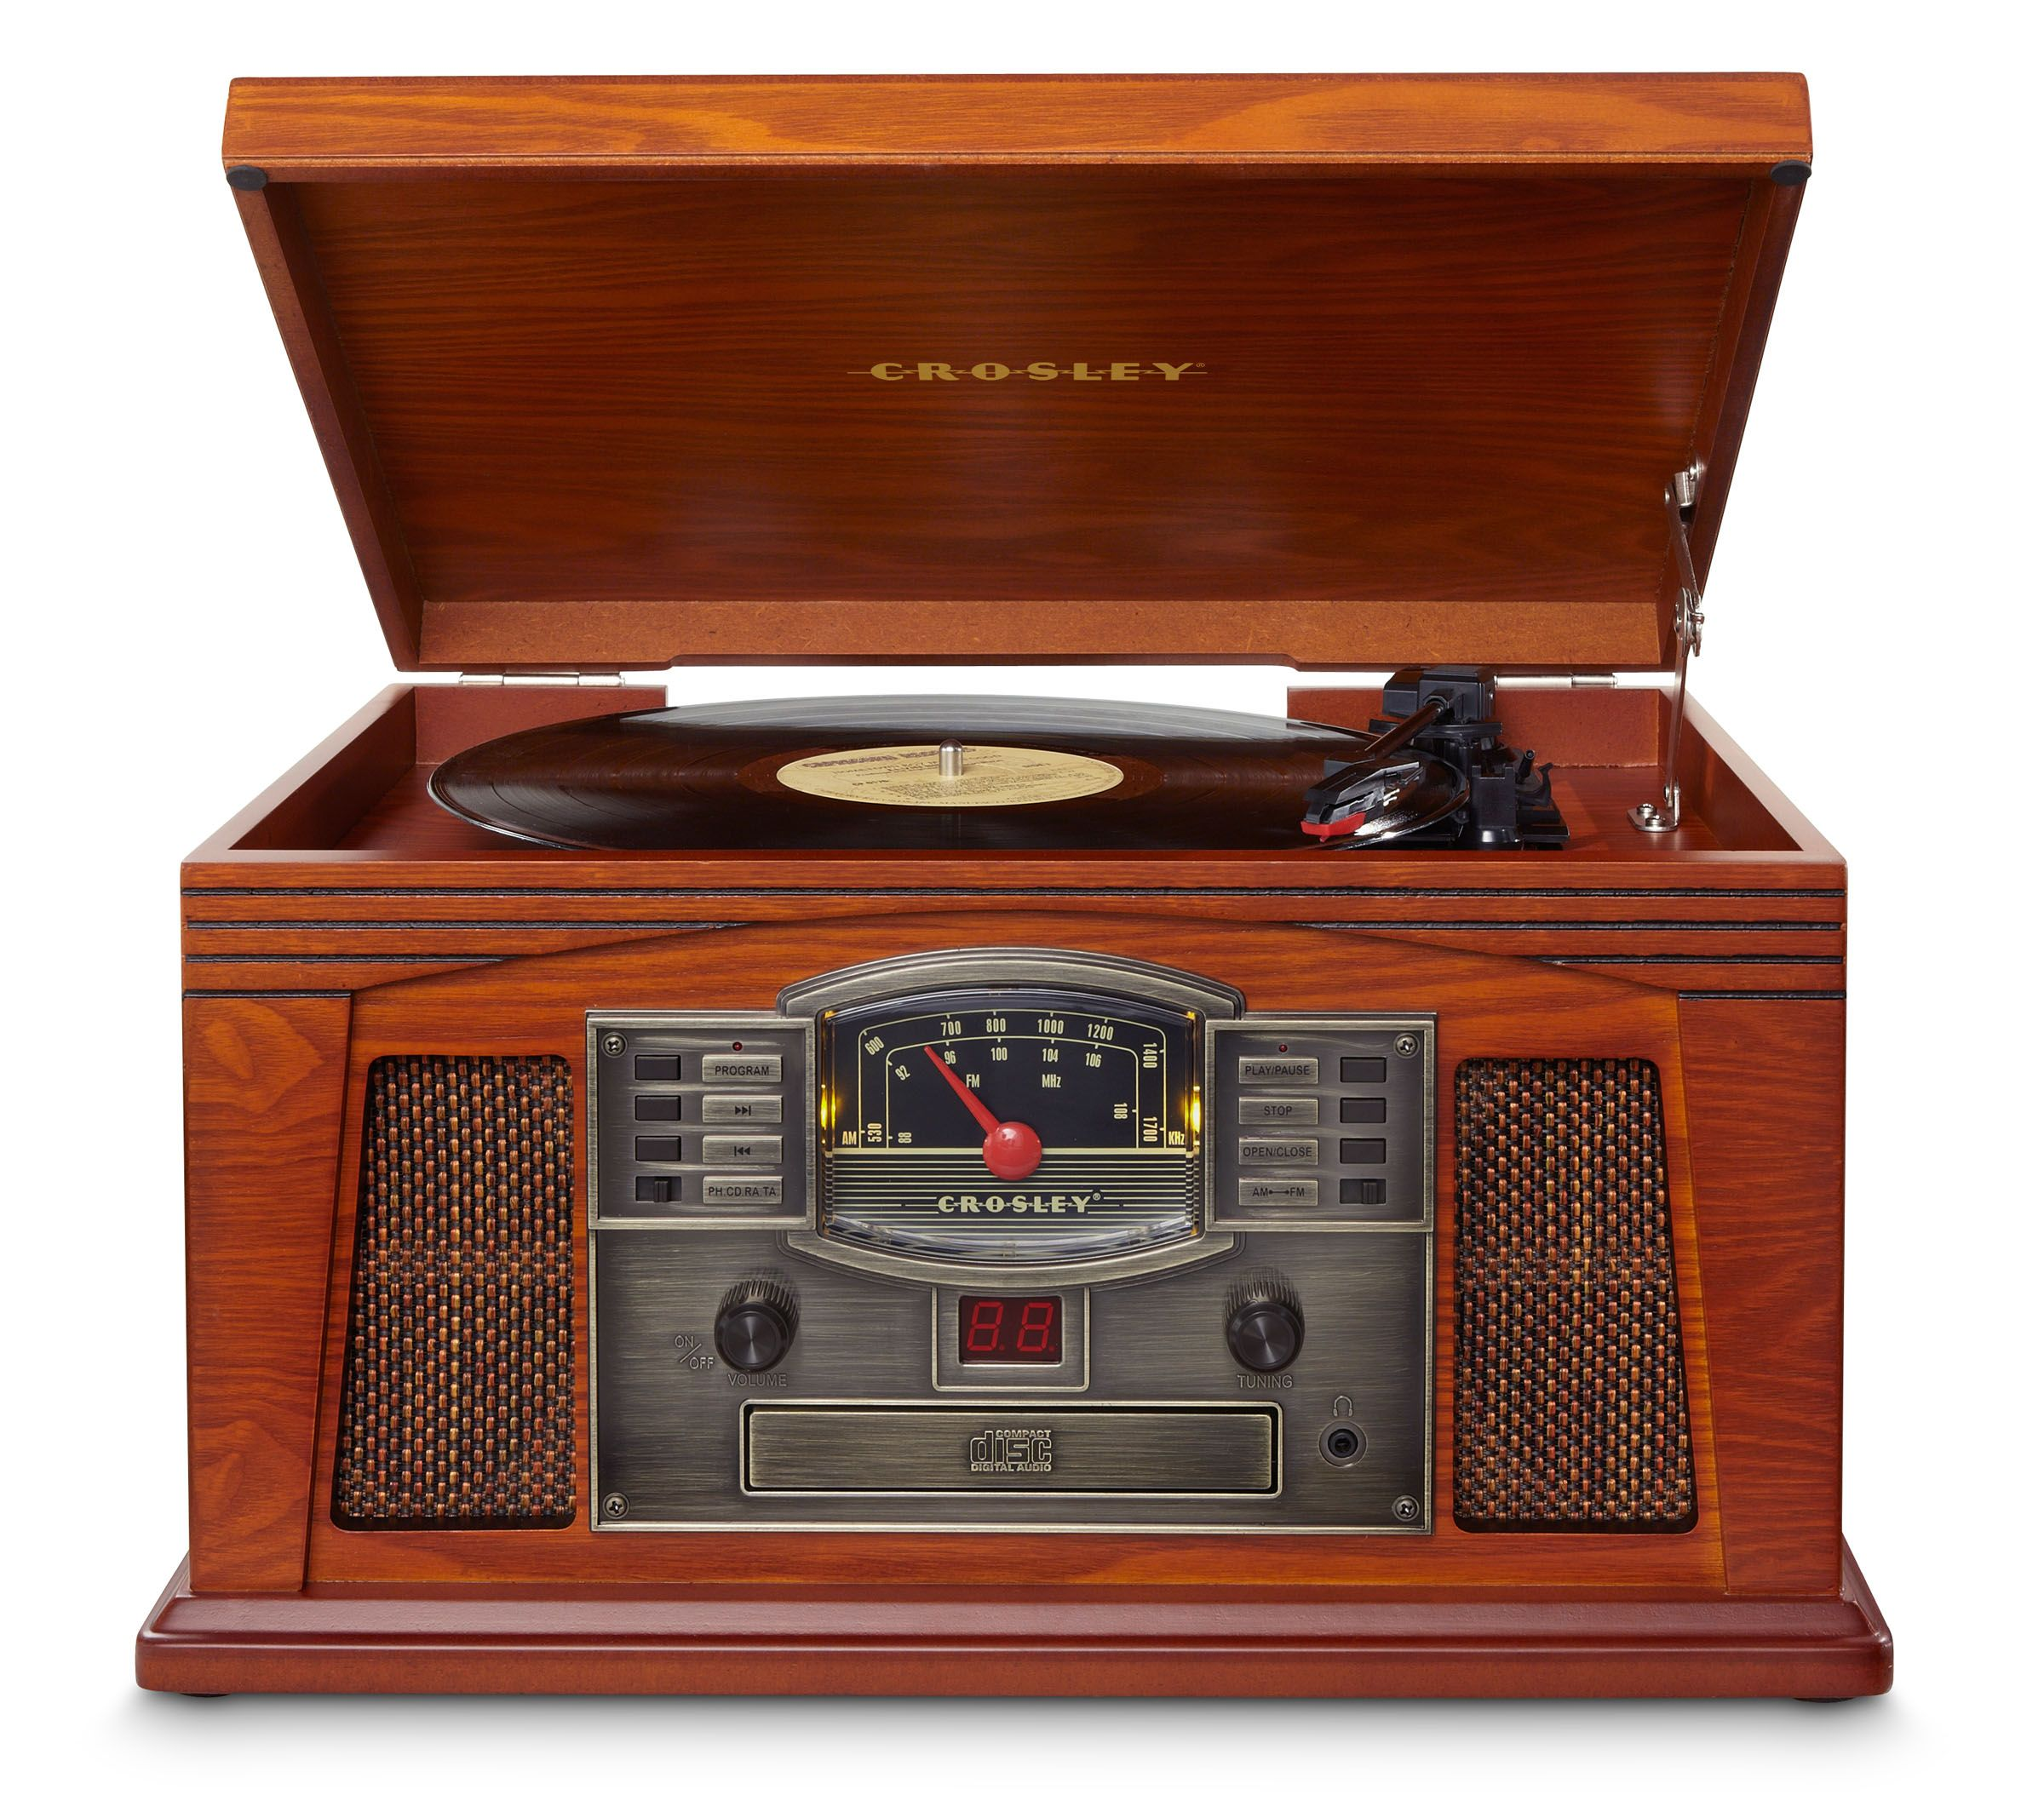 Nice Crosley | Lancaster   Paprika #crosley #entertainmentcenter #turntable  #recordplayer #vintage #